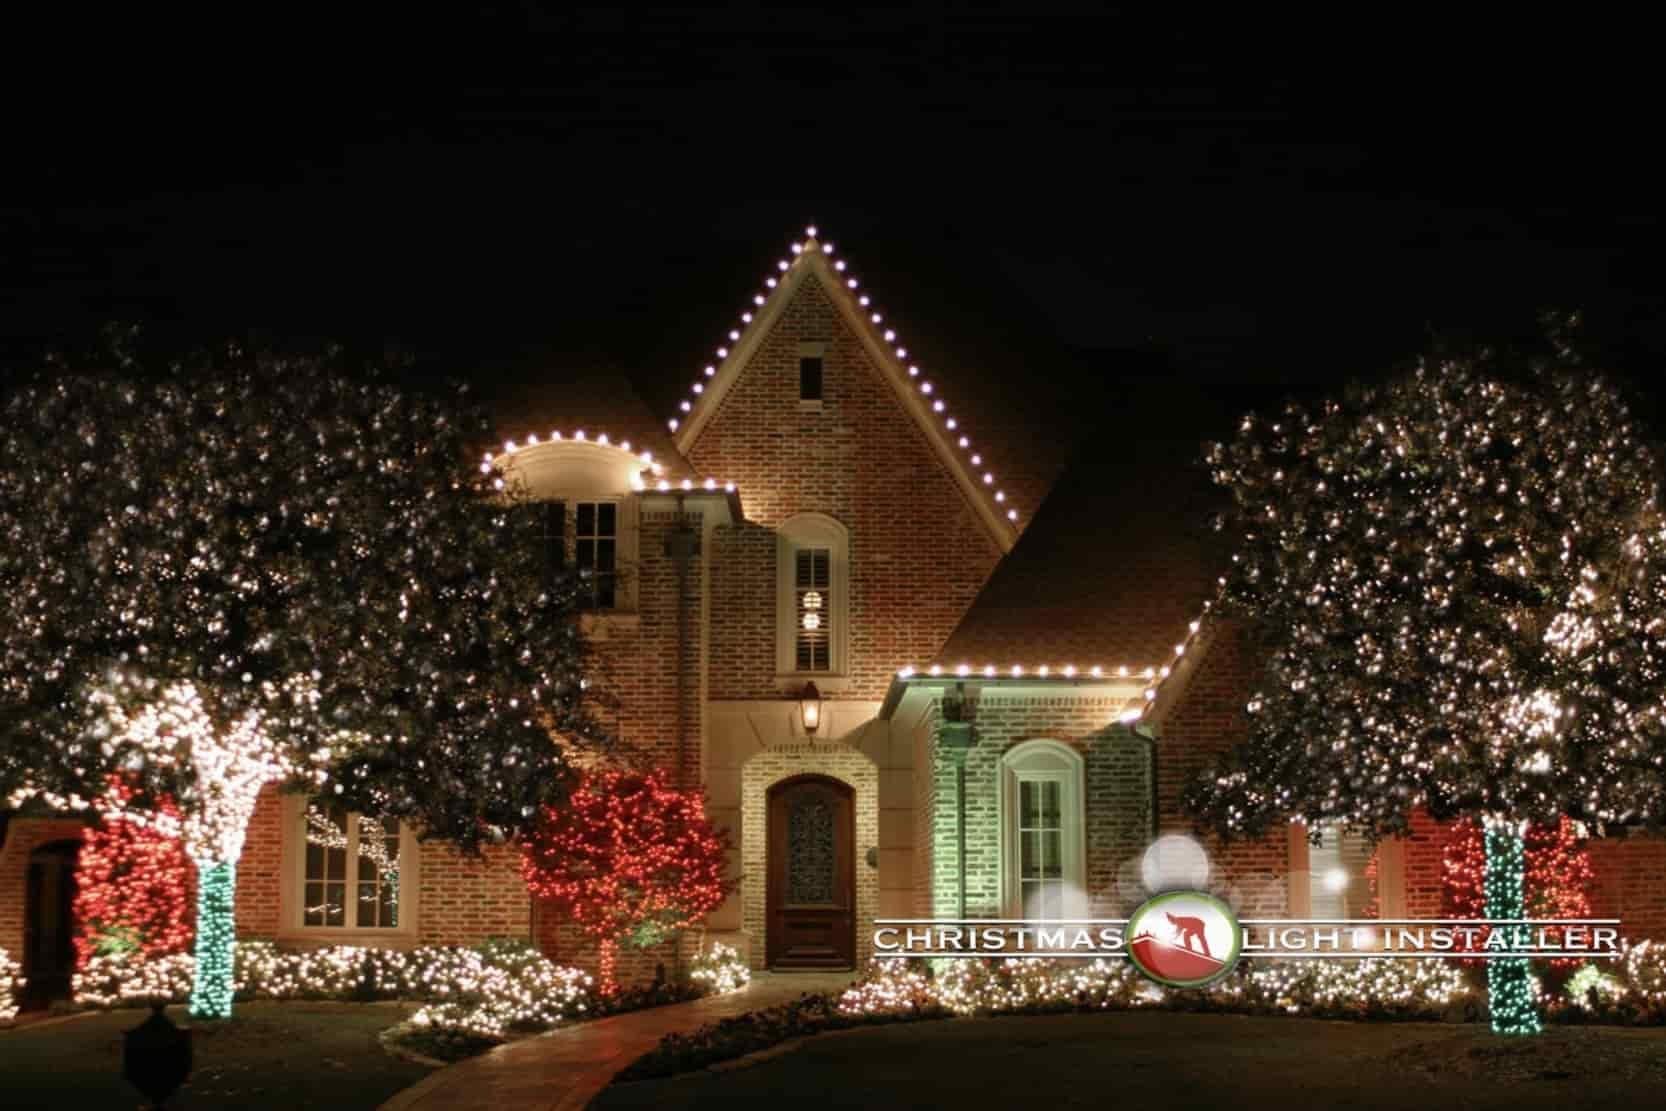 Christmas Light Install in DFW